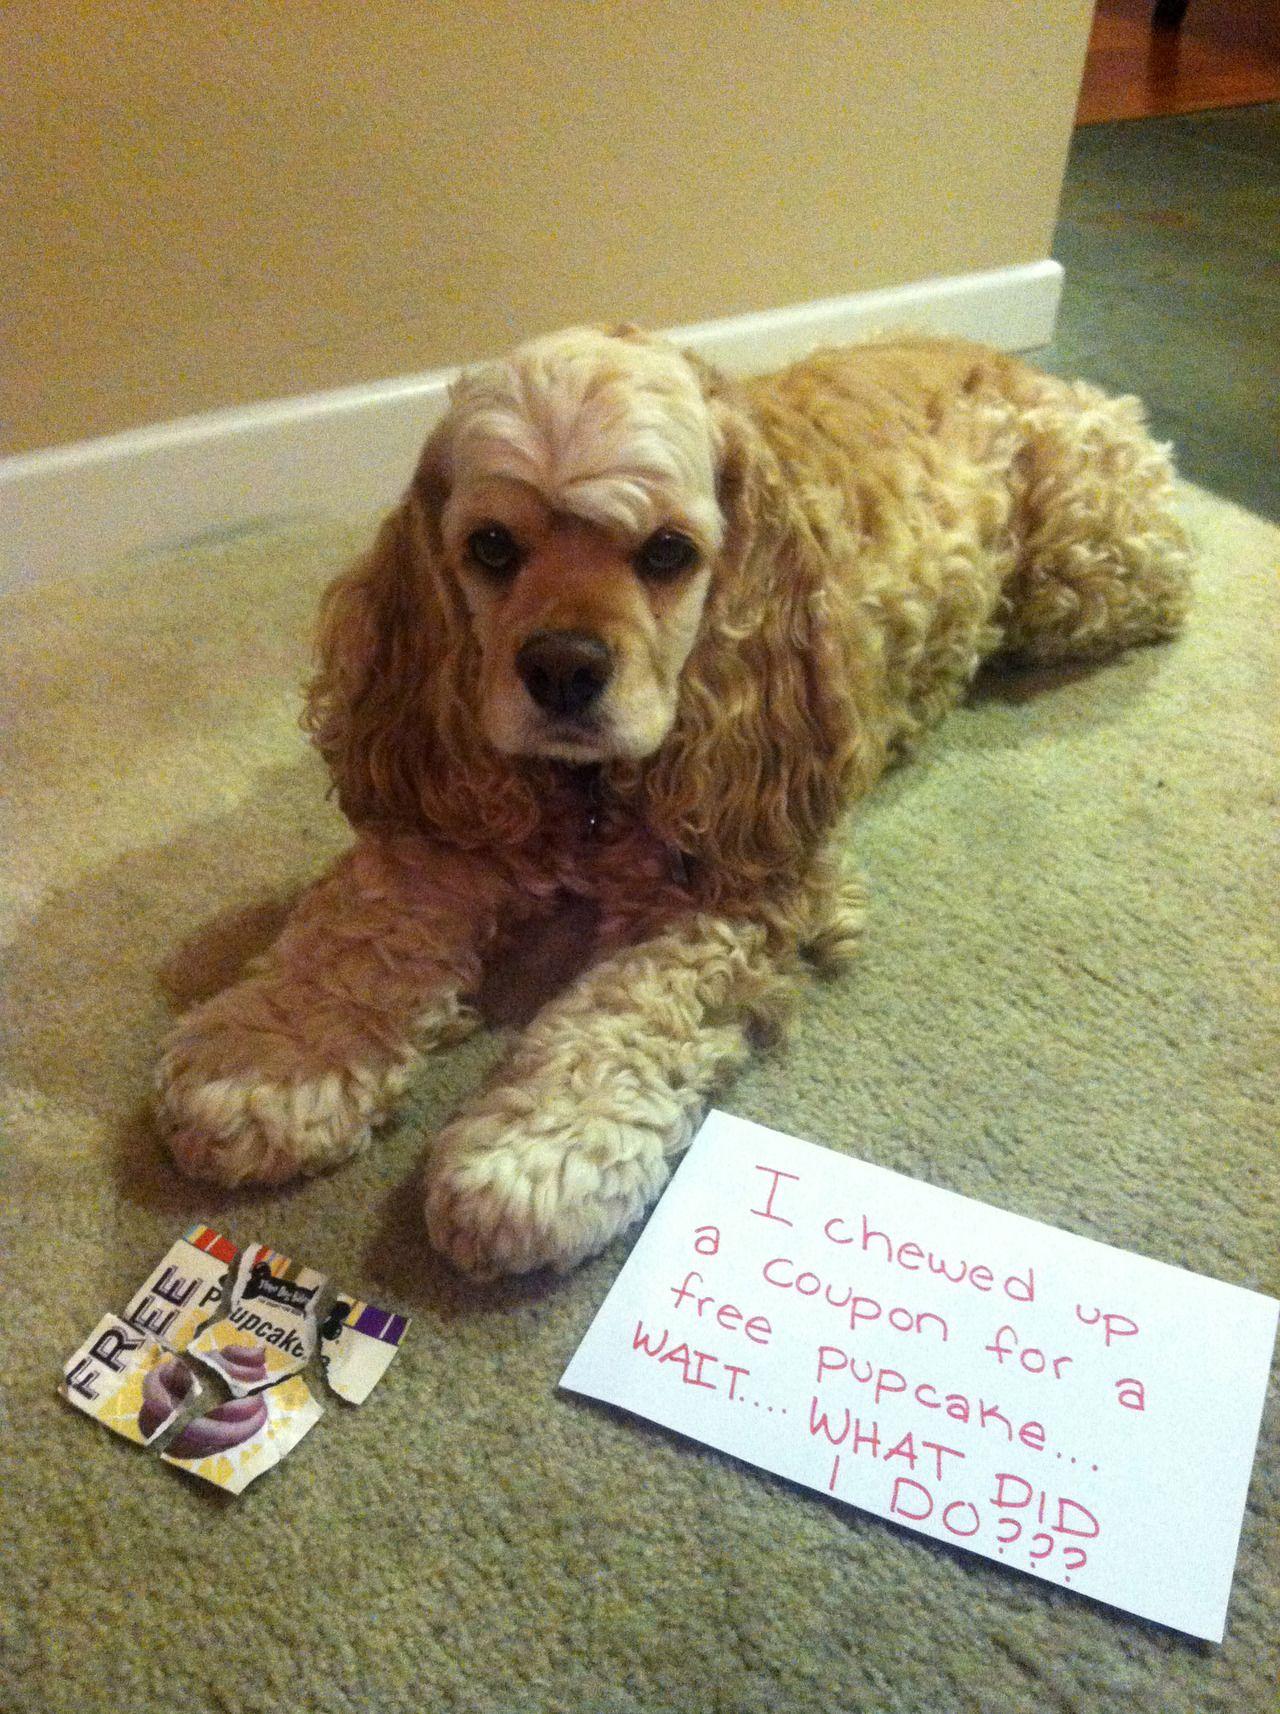 Dog Shame Awe Looks Just Like My Maxie Dog Shaming Funny Dog Shaming Cocker Spaniel Dog